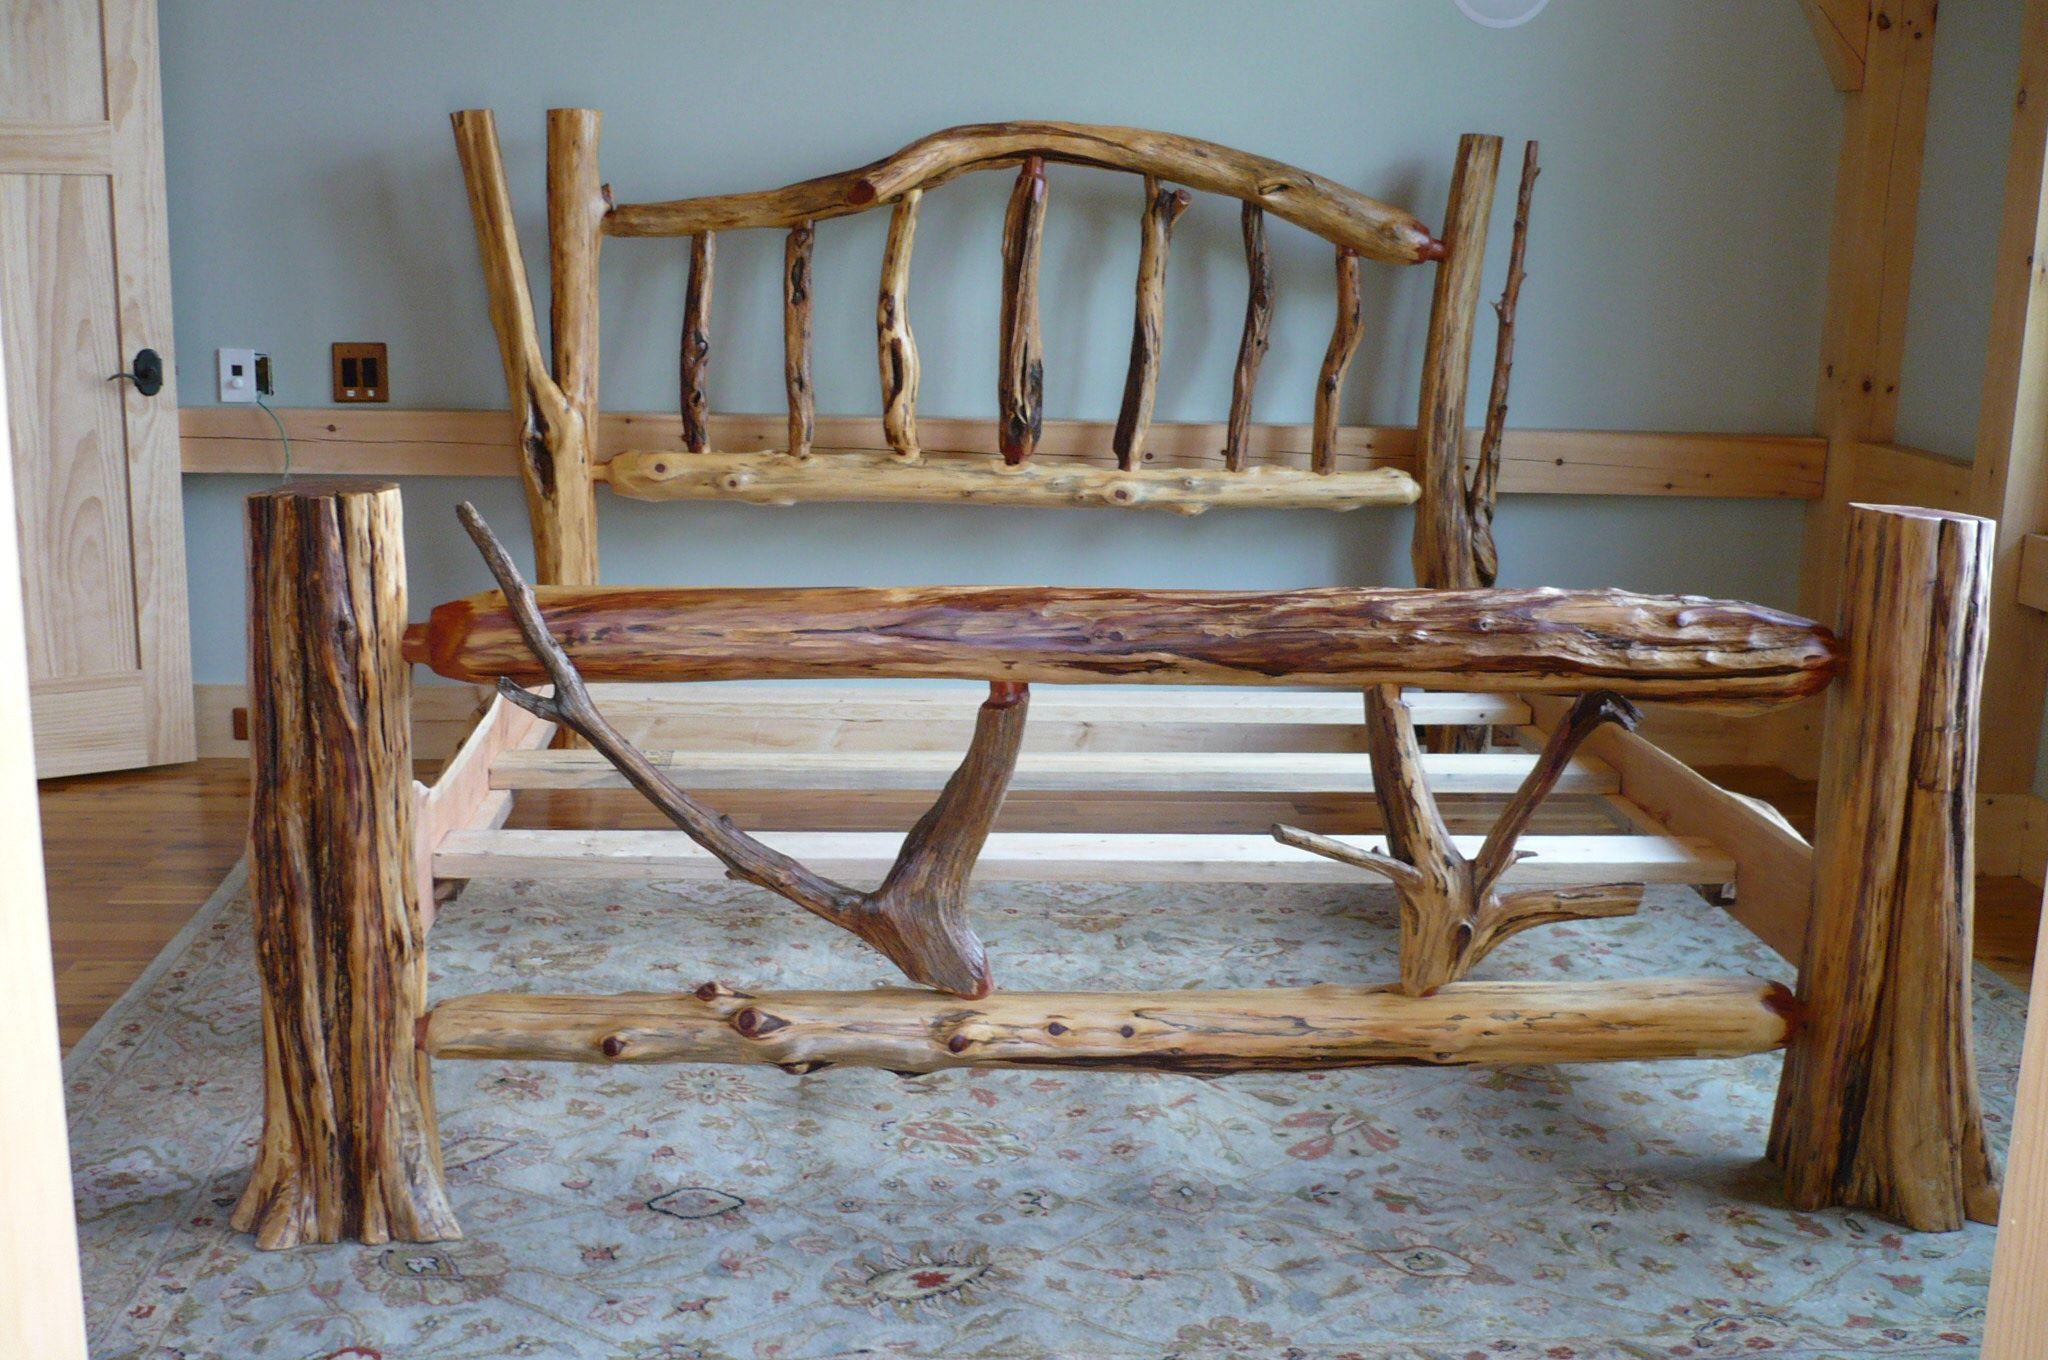 Rustic Log Beds Rustic wood furniture, Log home